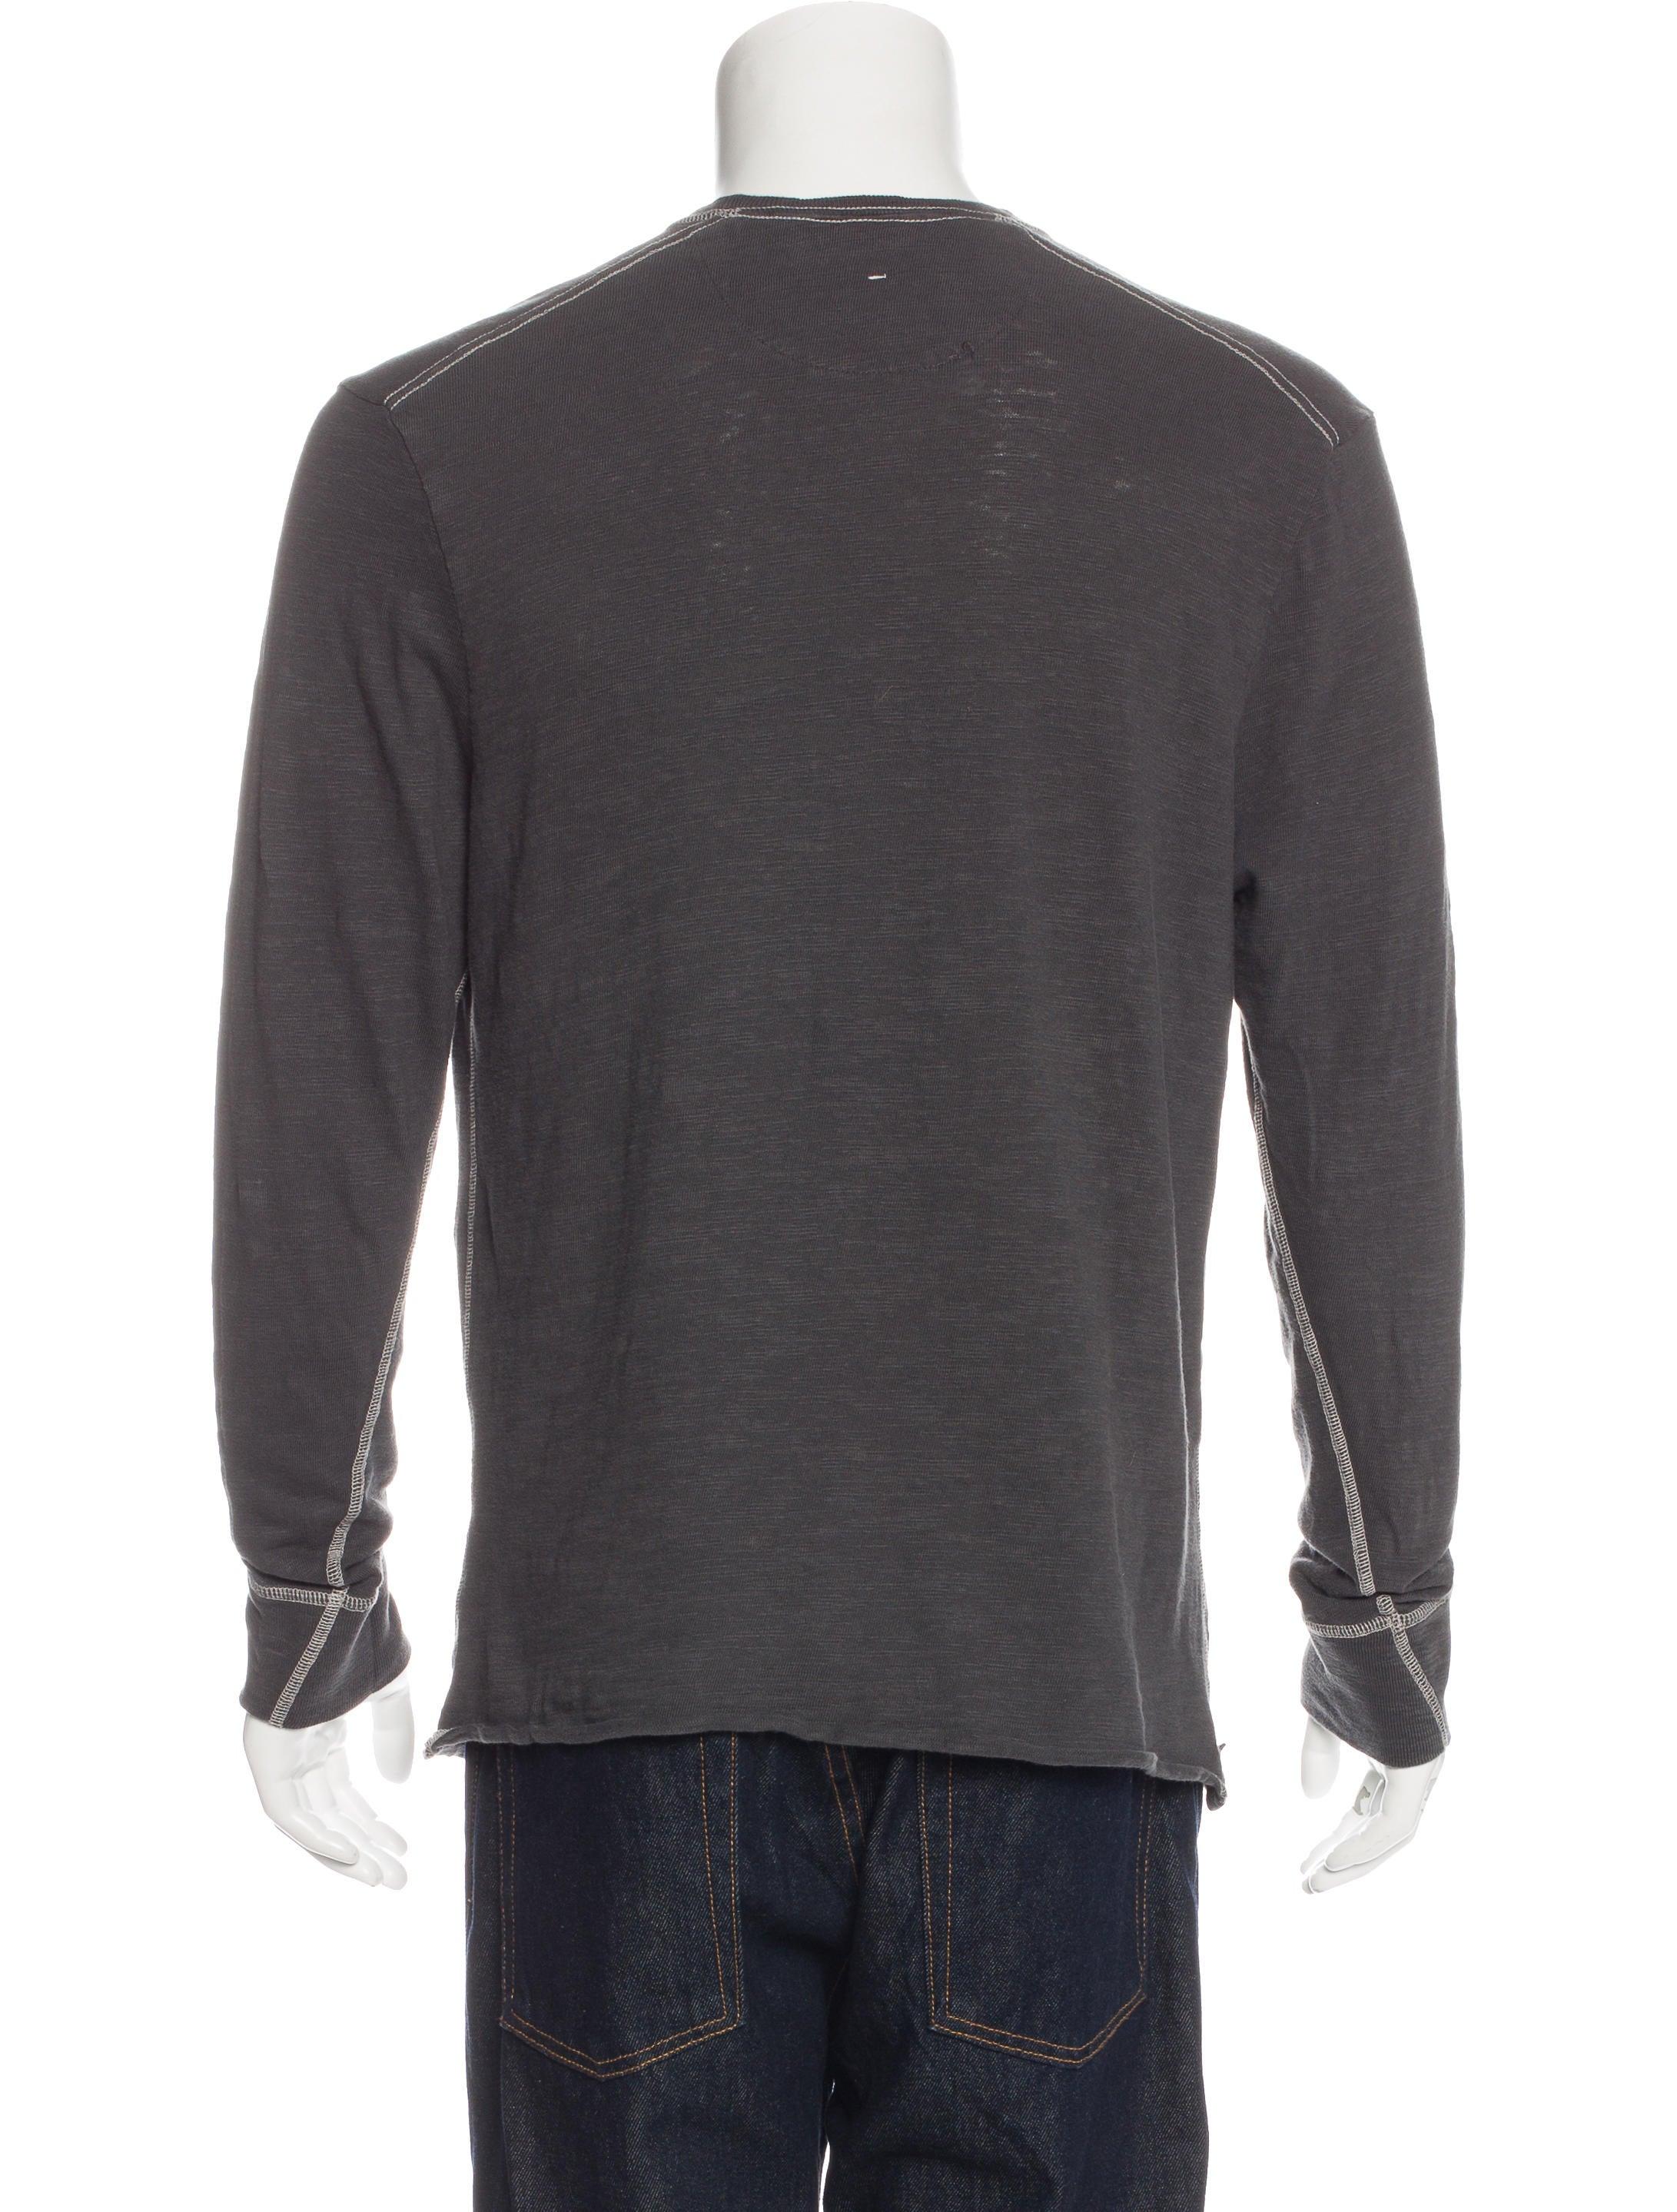 Rag bone crew neck long sleeve t shirt clothing for Rag and bone t shirts